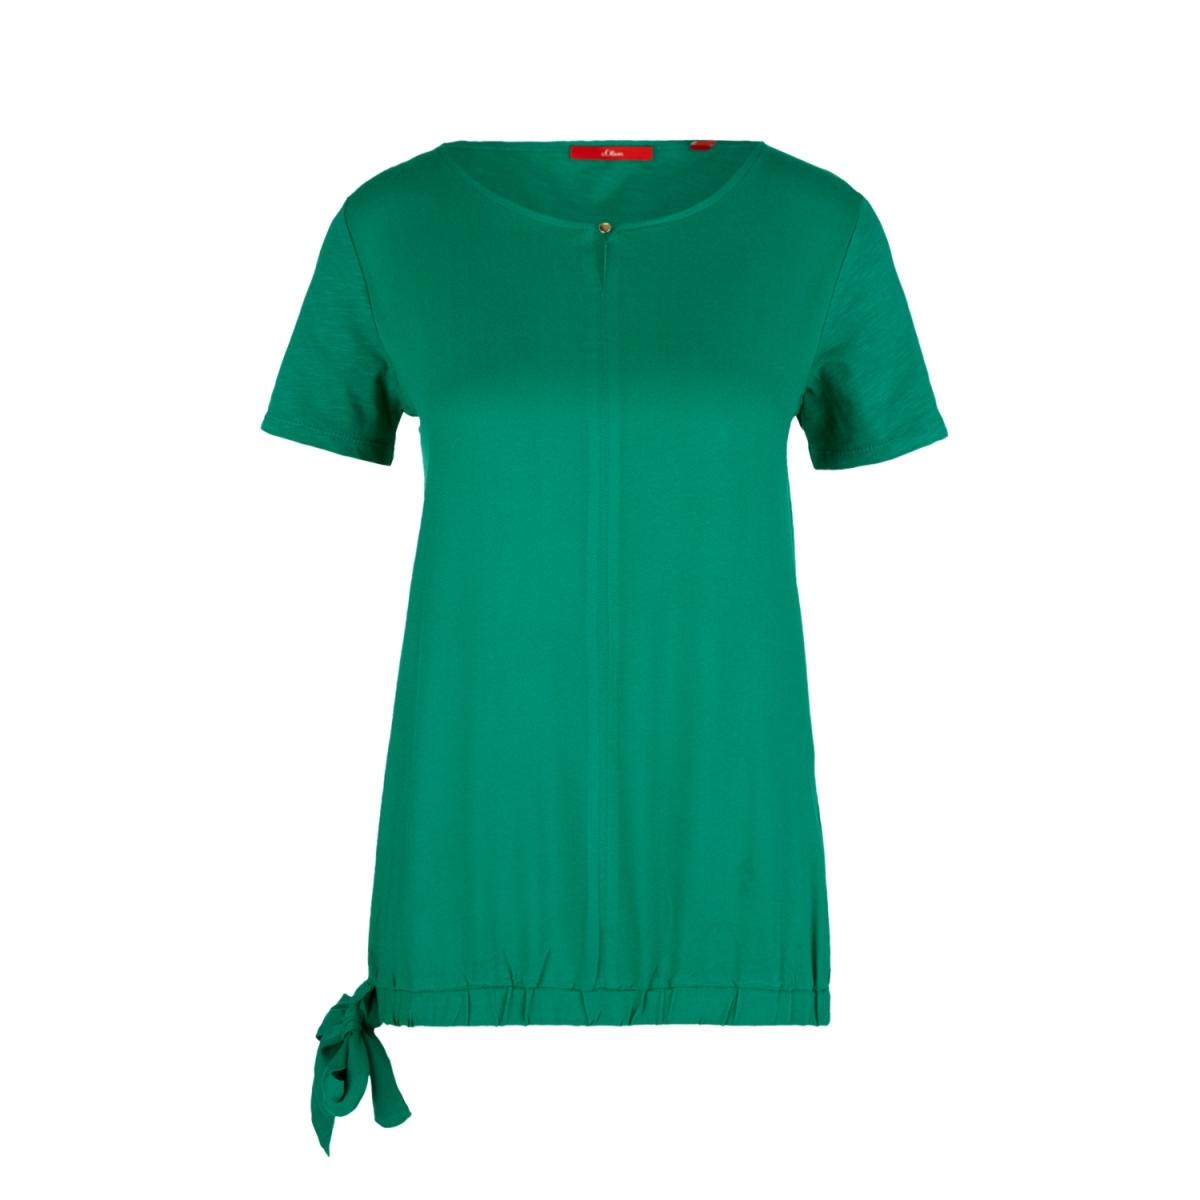 t shirt met strik detail 14908328316 s.oliver t-shirt 7652